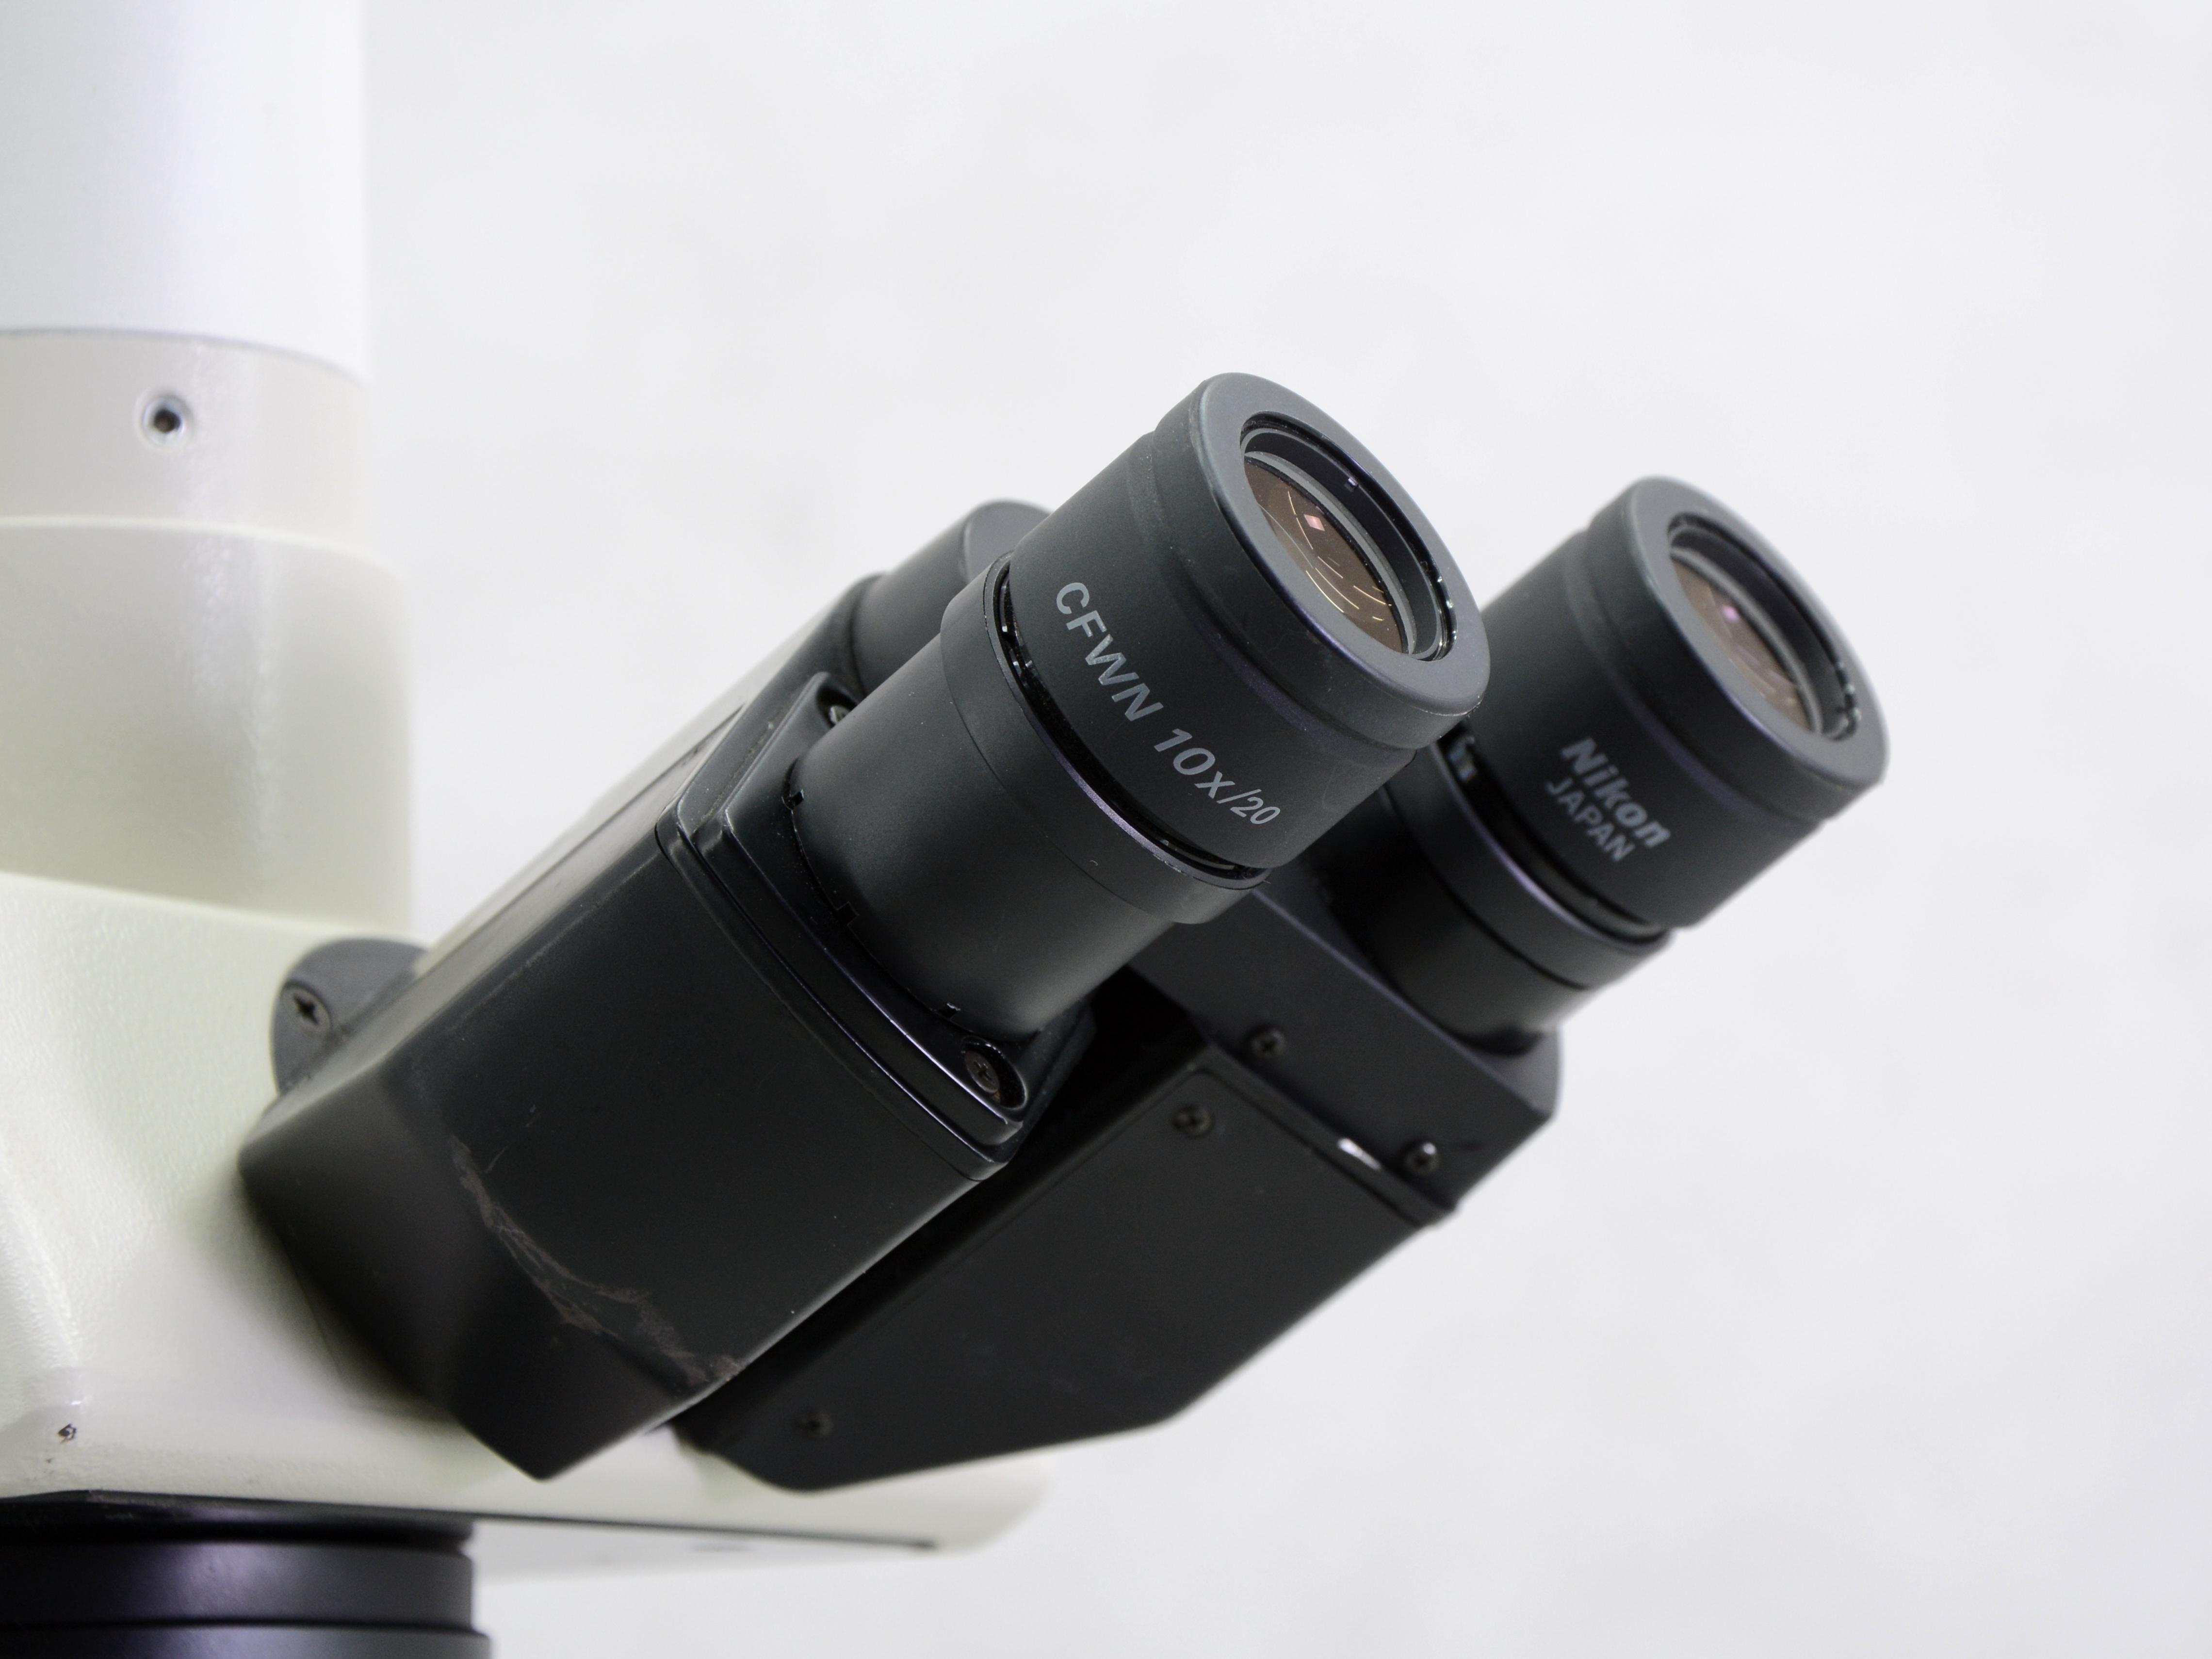 Nikon Optiphot-2 Microscope - Gemini BV